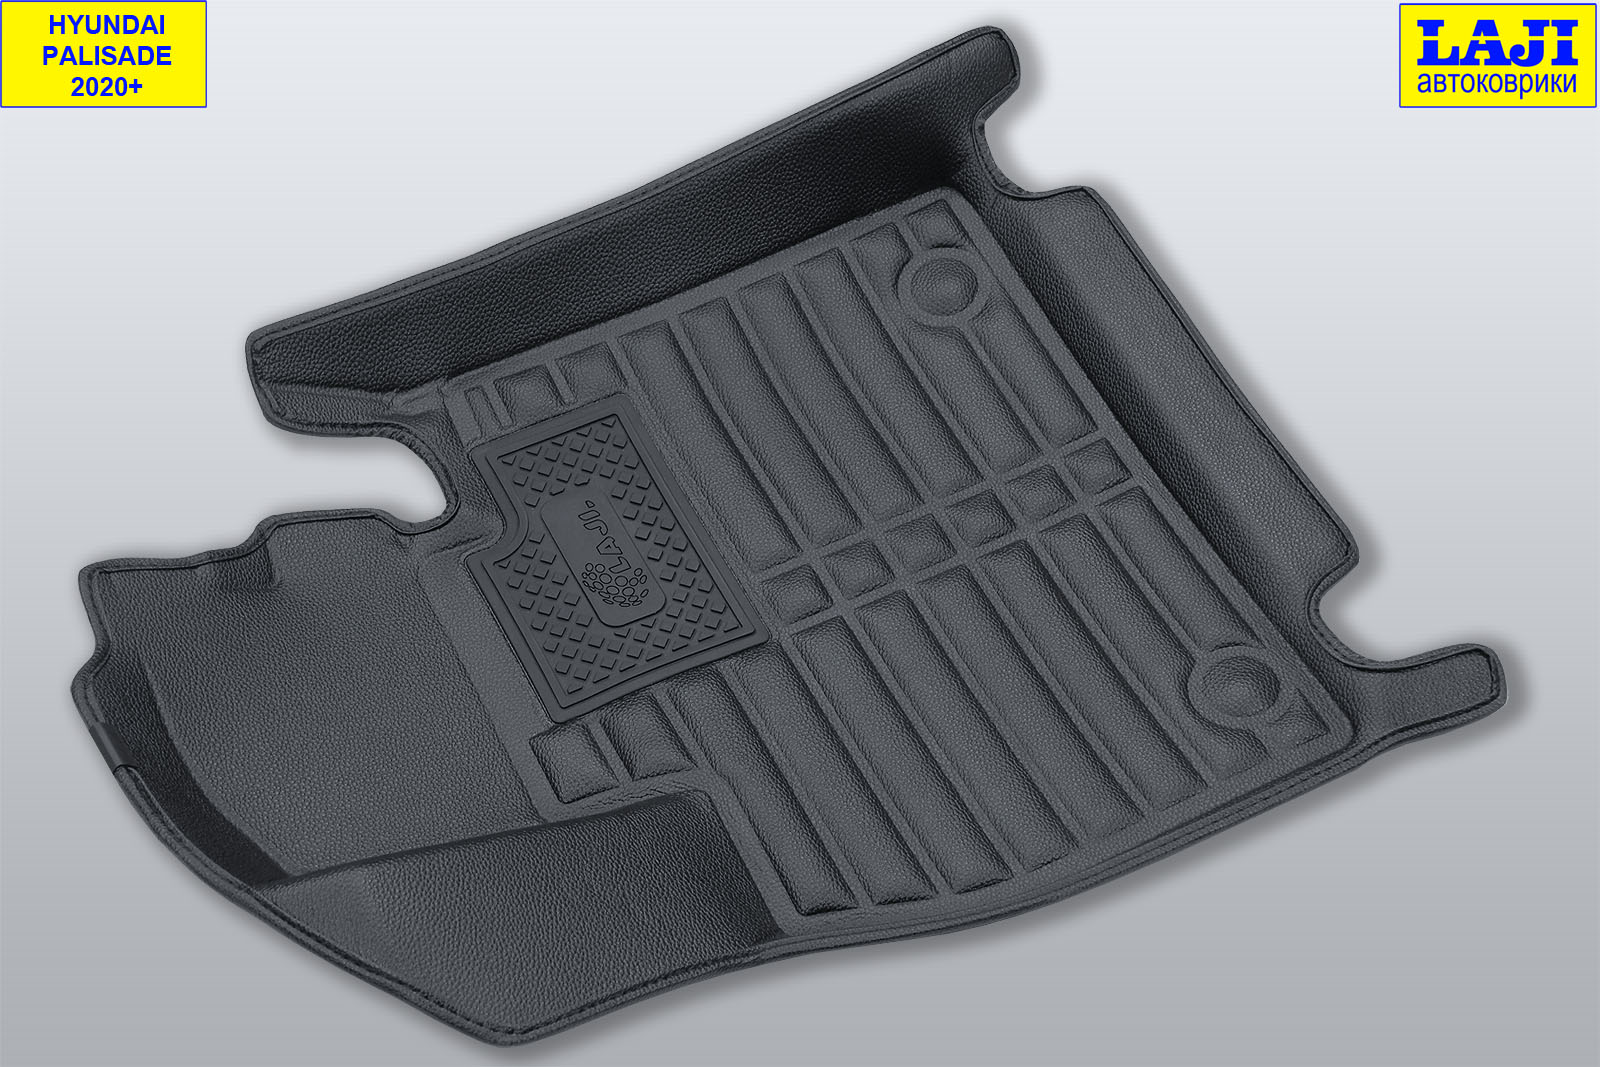 5D коврики в салон Hyundai Palisade 2020-н.в. 3